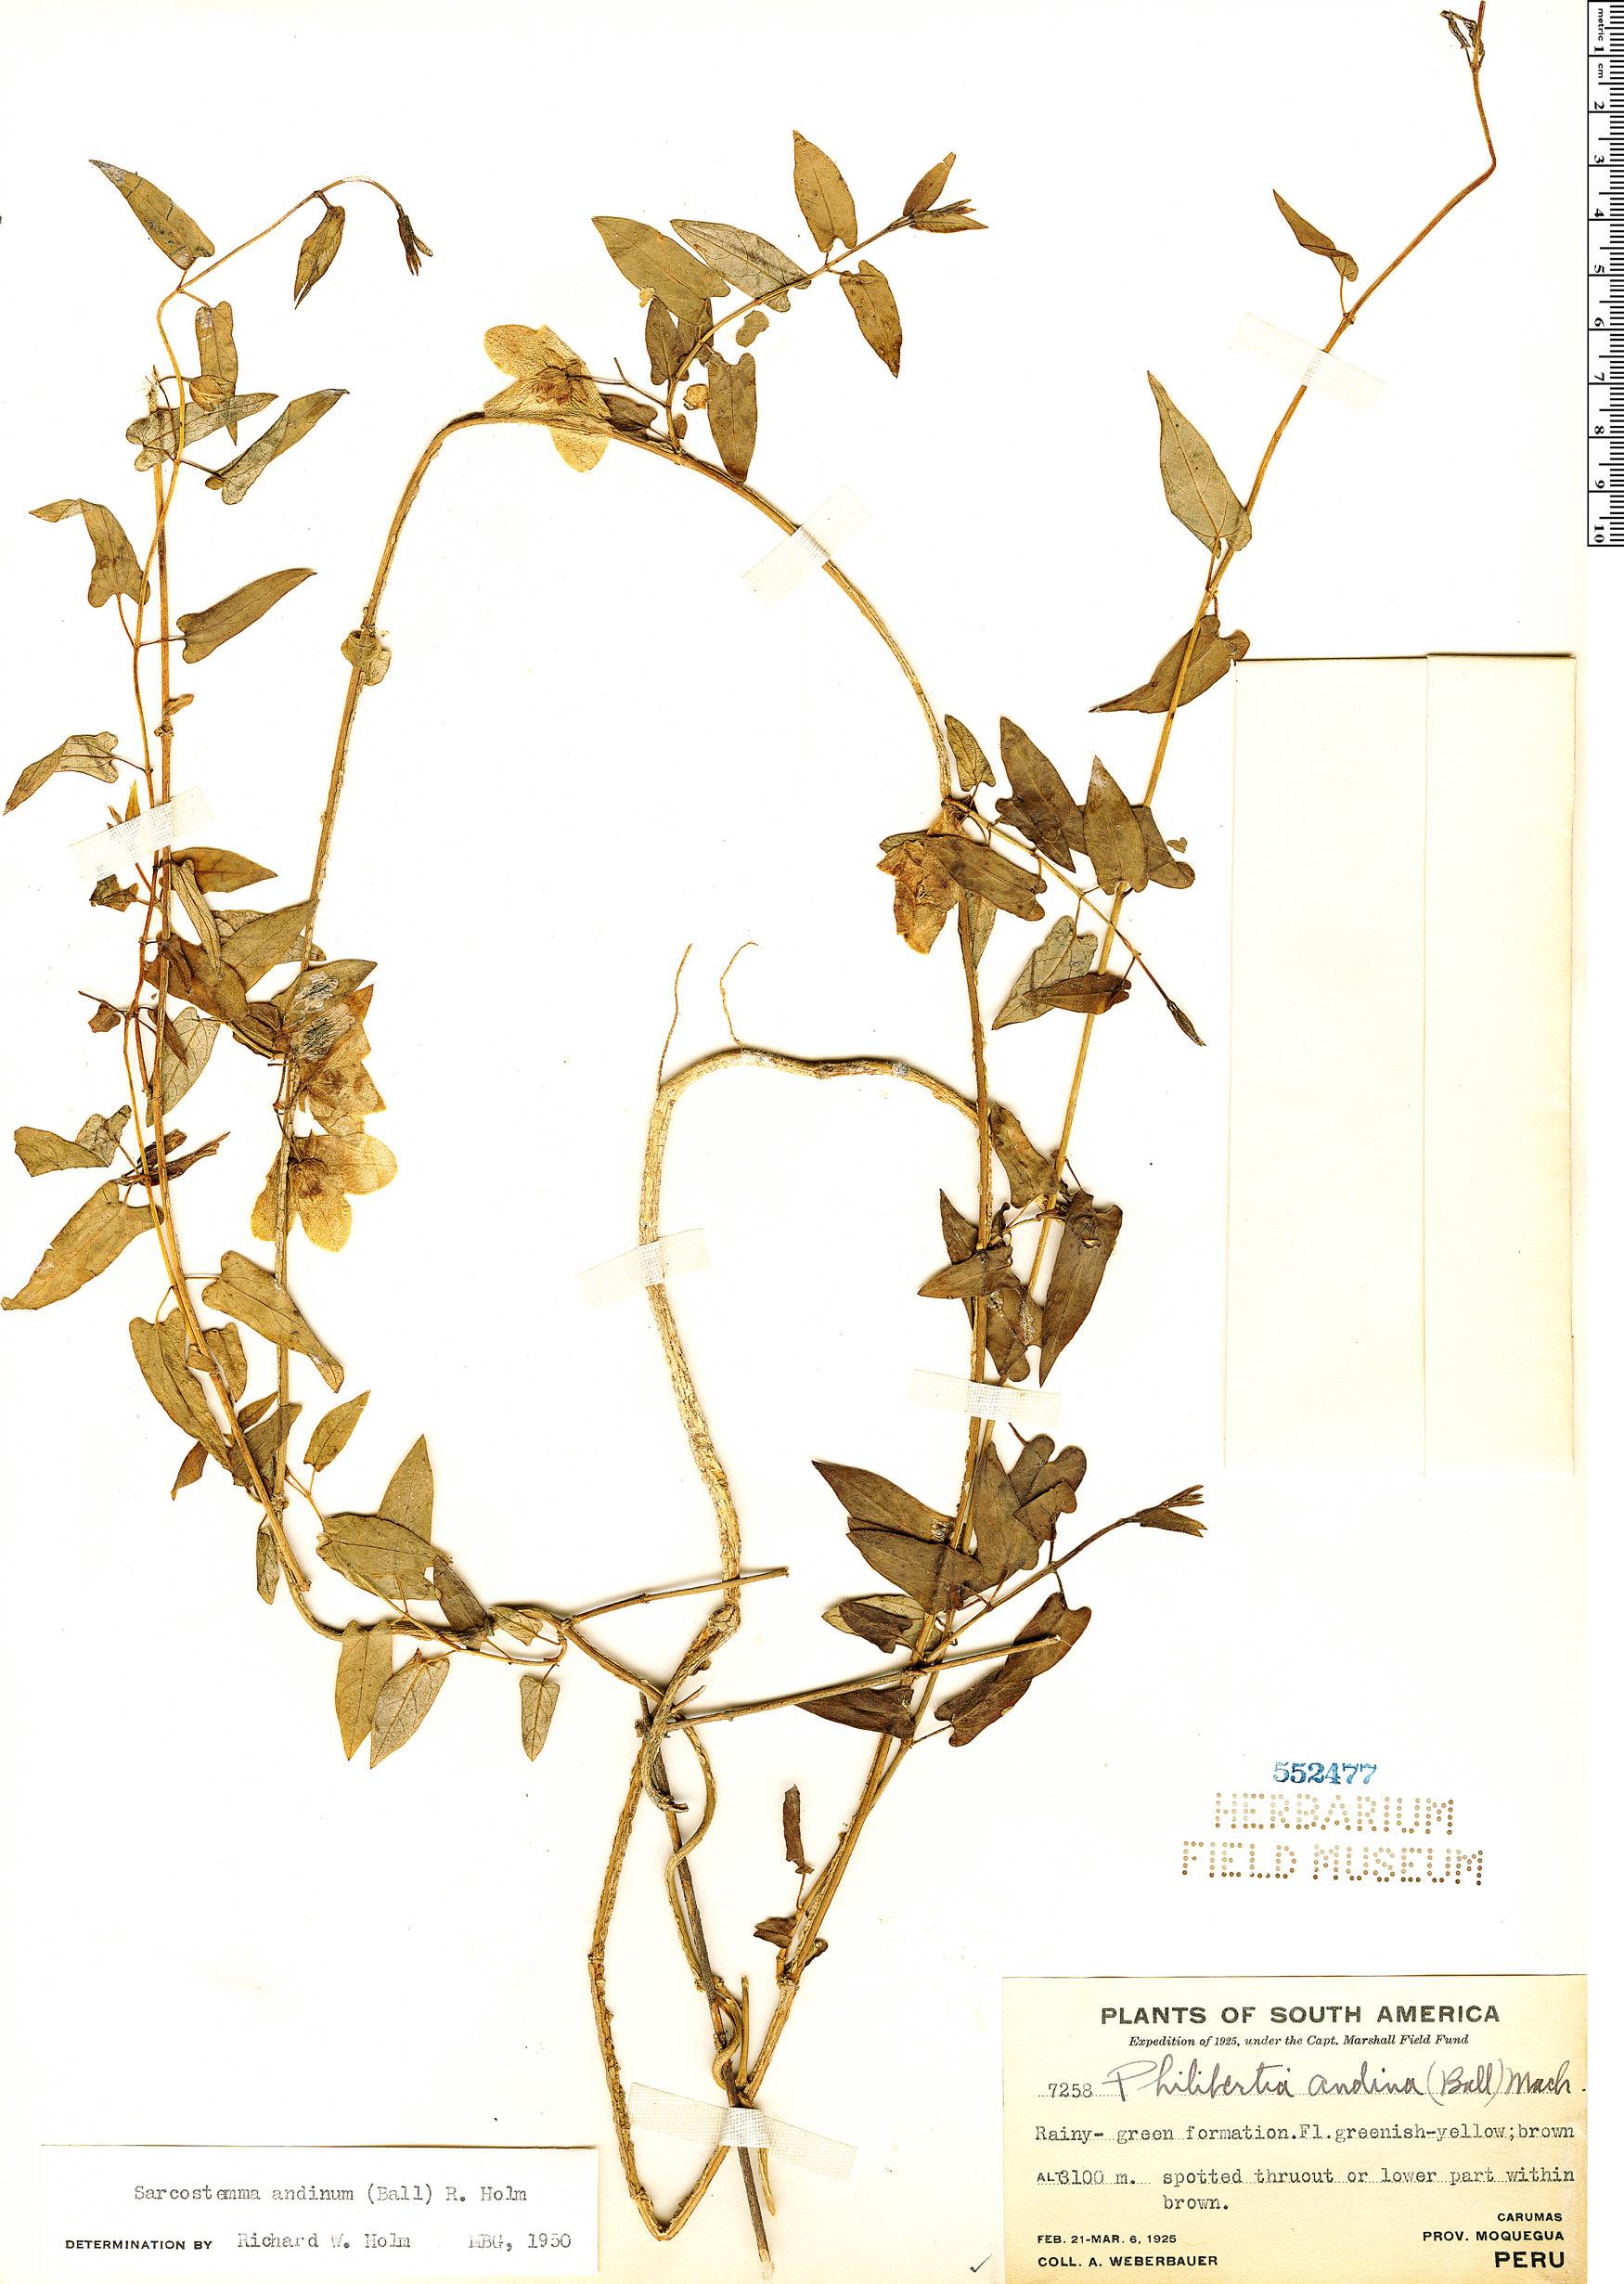 Specimen: Pentacyphus andinus